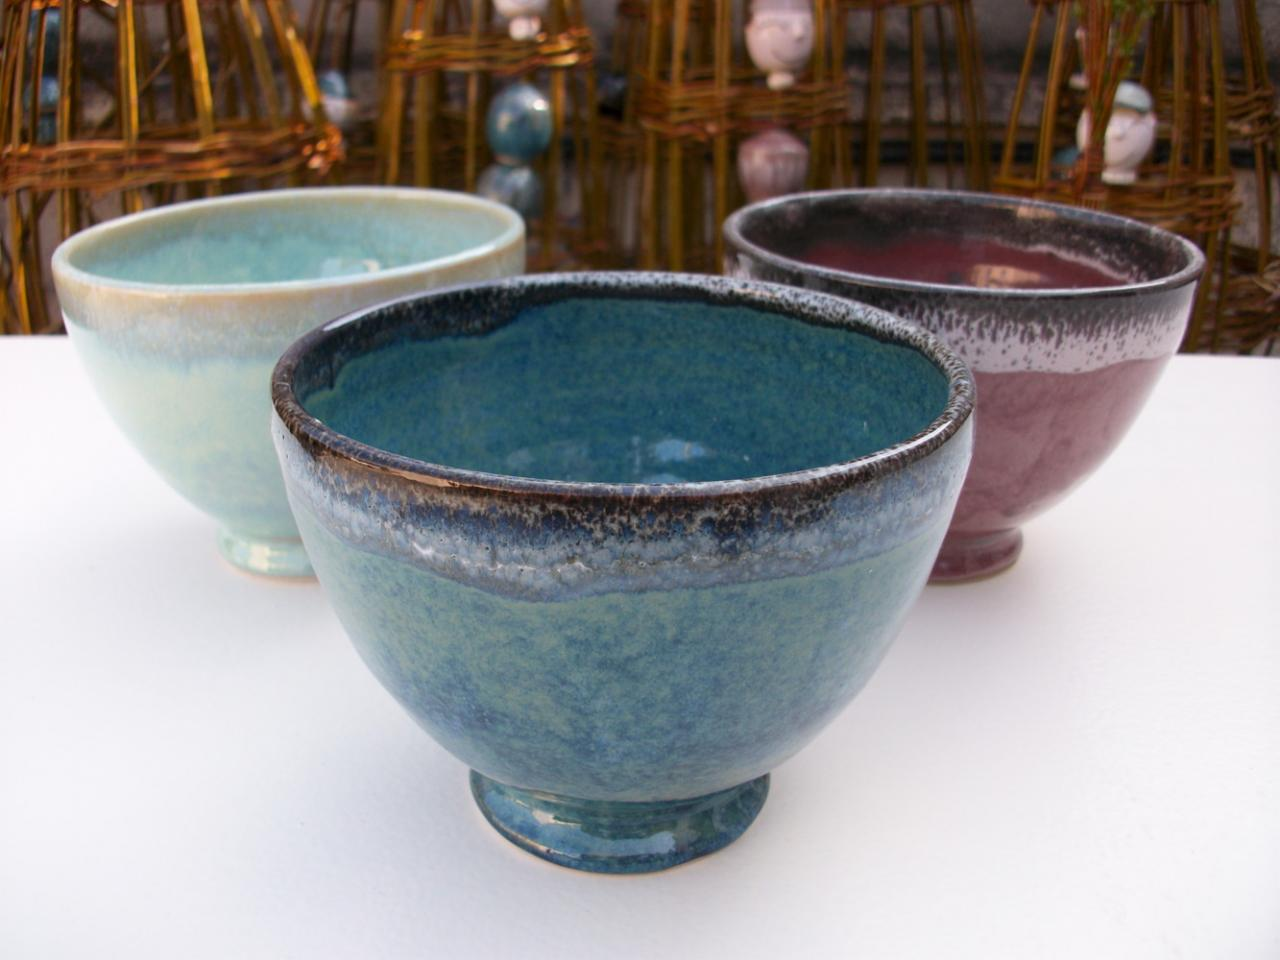 vaisselle poterie artisanale ustensiles de cuisine. Black Bedroom Furniture Sets. Home Design Ideas